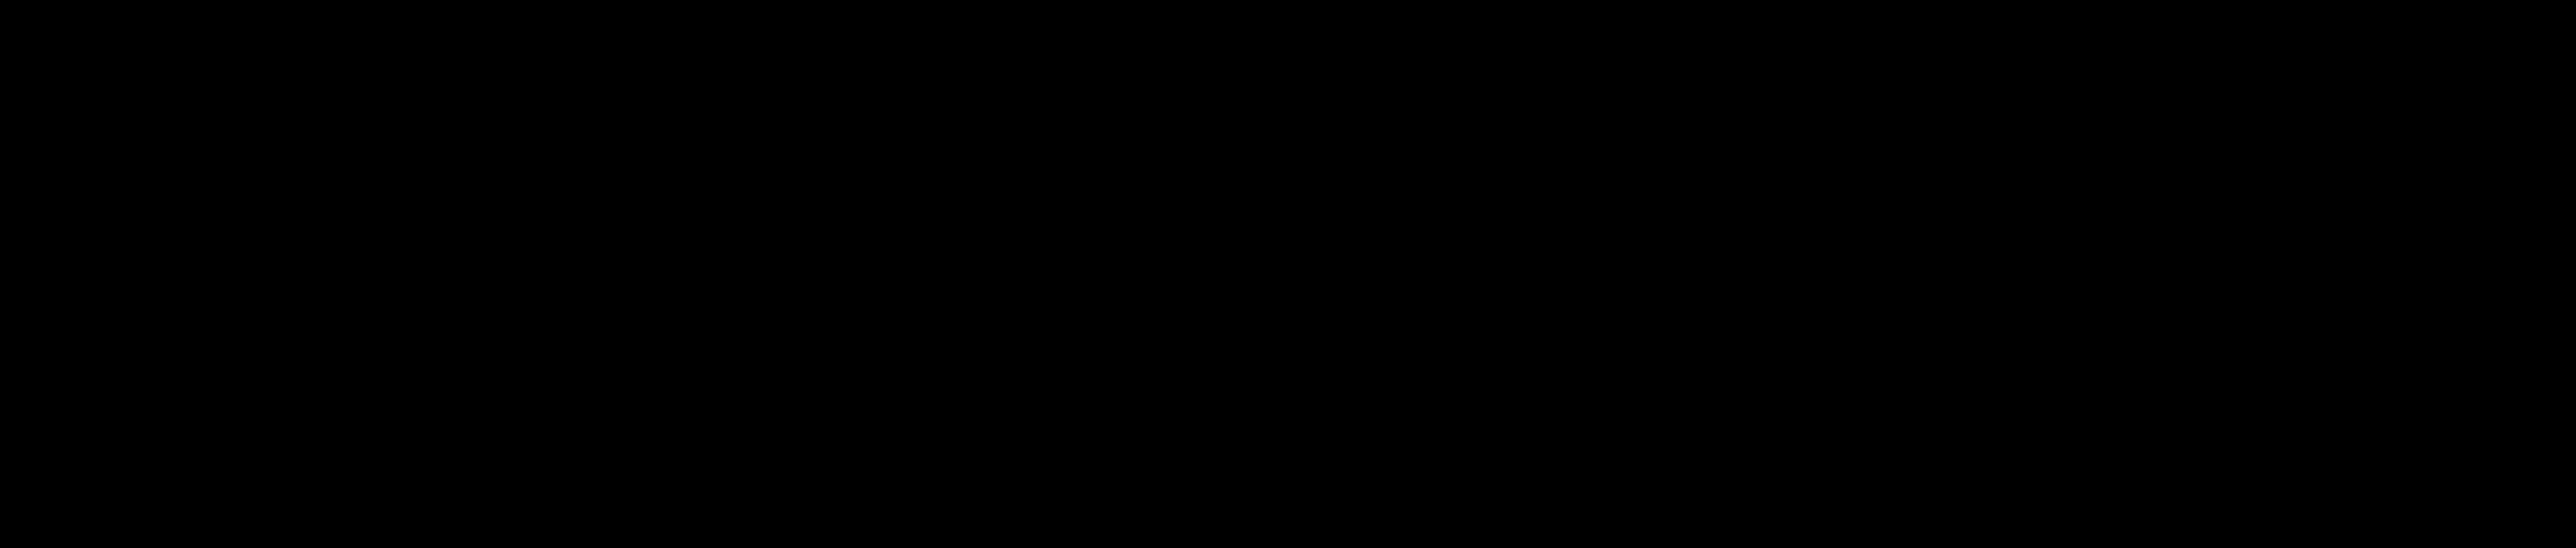 (E)-3-(3,4-Dimethoxybenzylidene)-7-(6-(1,2,3,4-tetrahydroacridin-9-ylamino)hexyloxy)chroman-4-one